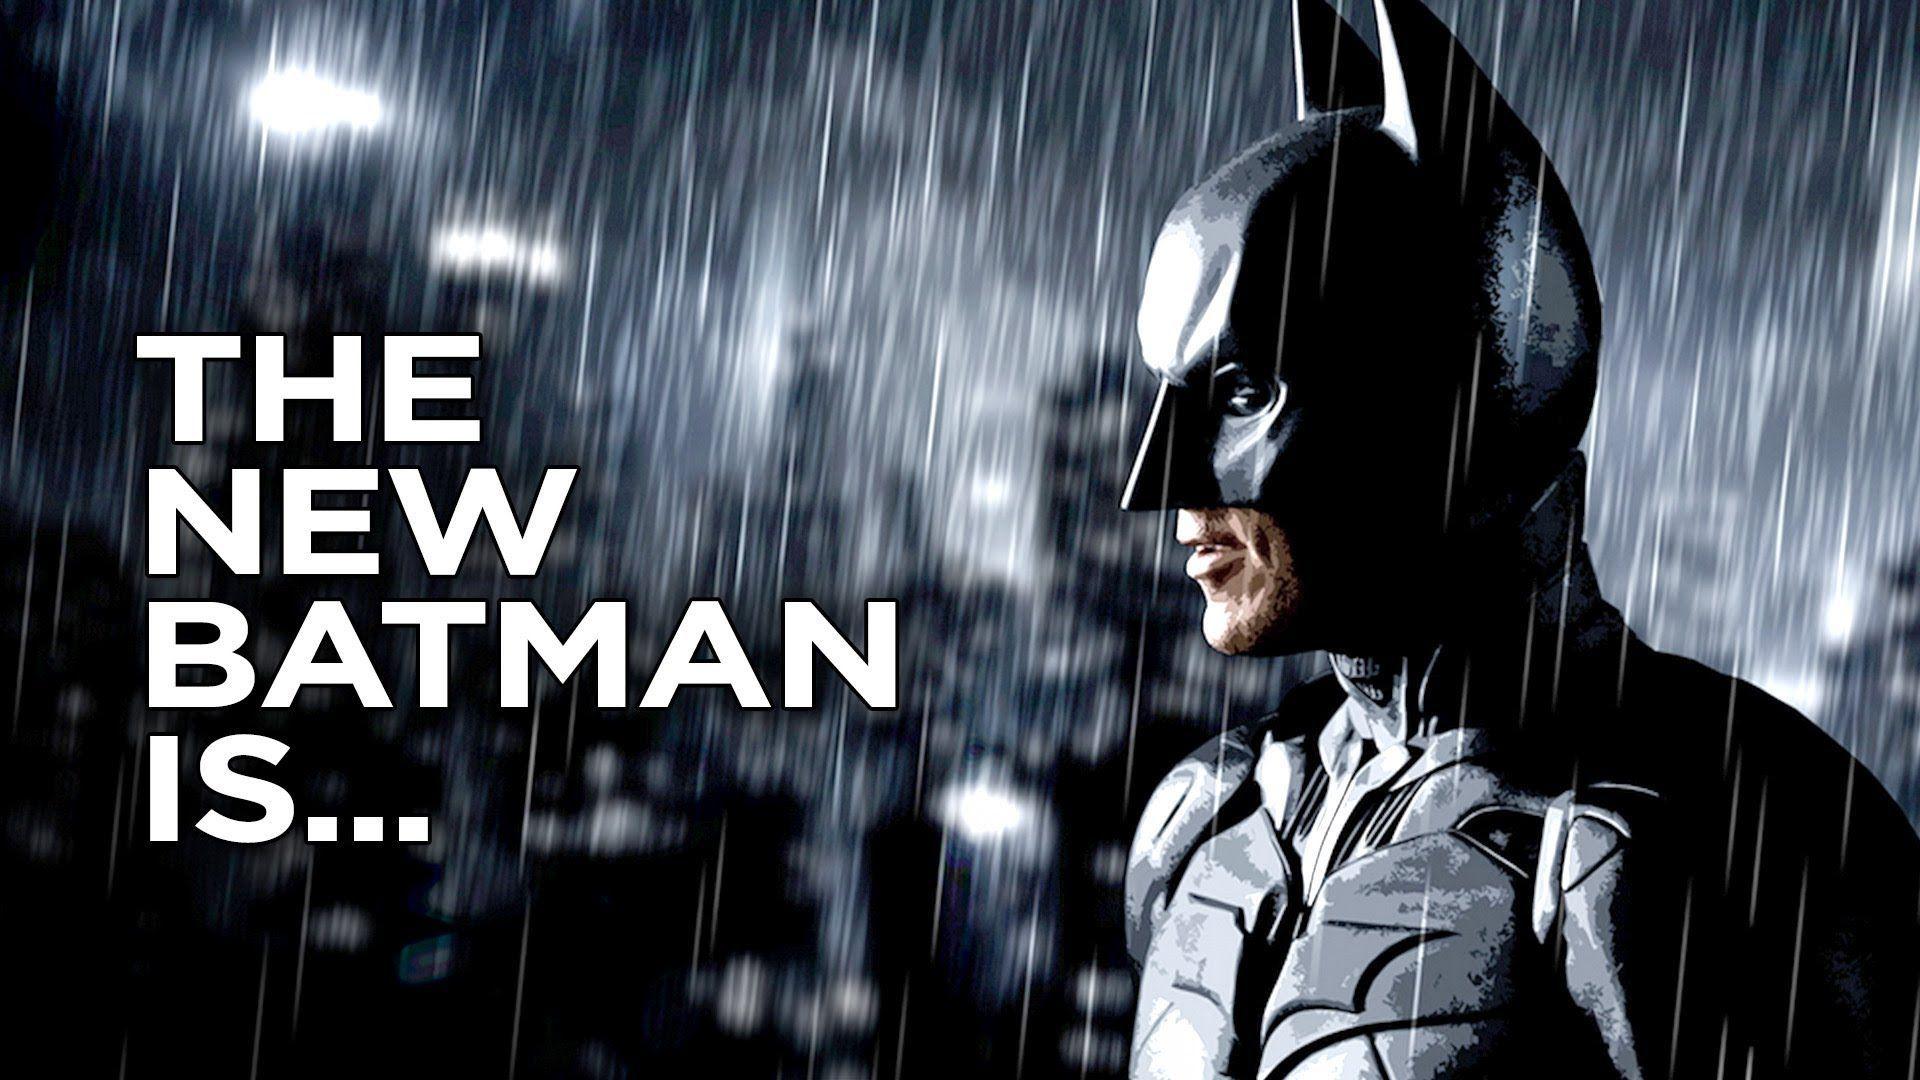 New Batman Movie Wallpaper - 1080p Images Of Batman In Hd , HD Wallpaper & Backgrounds